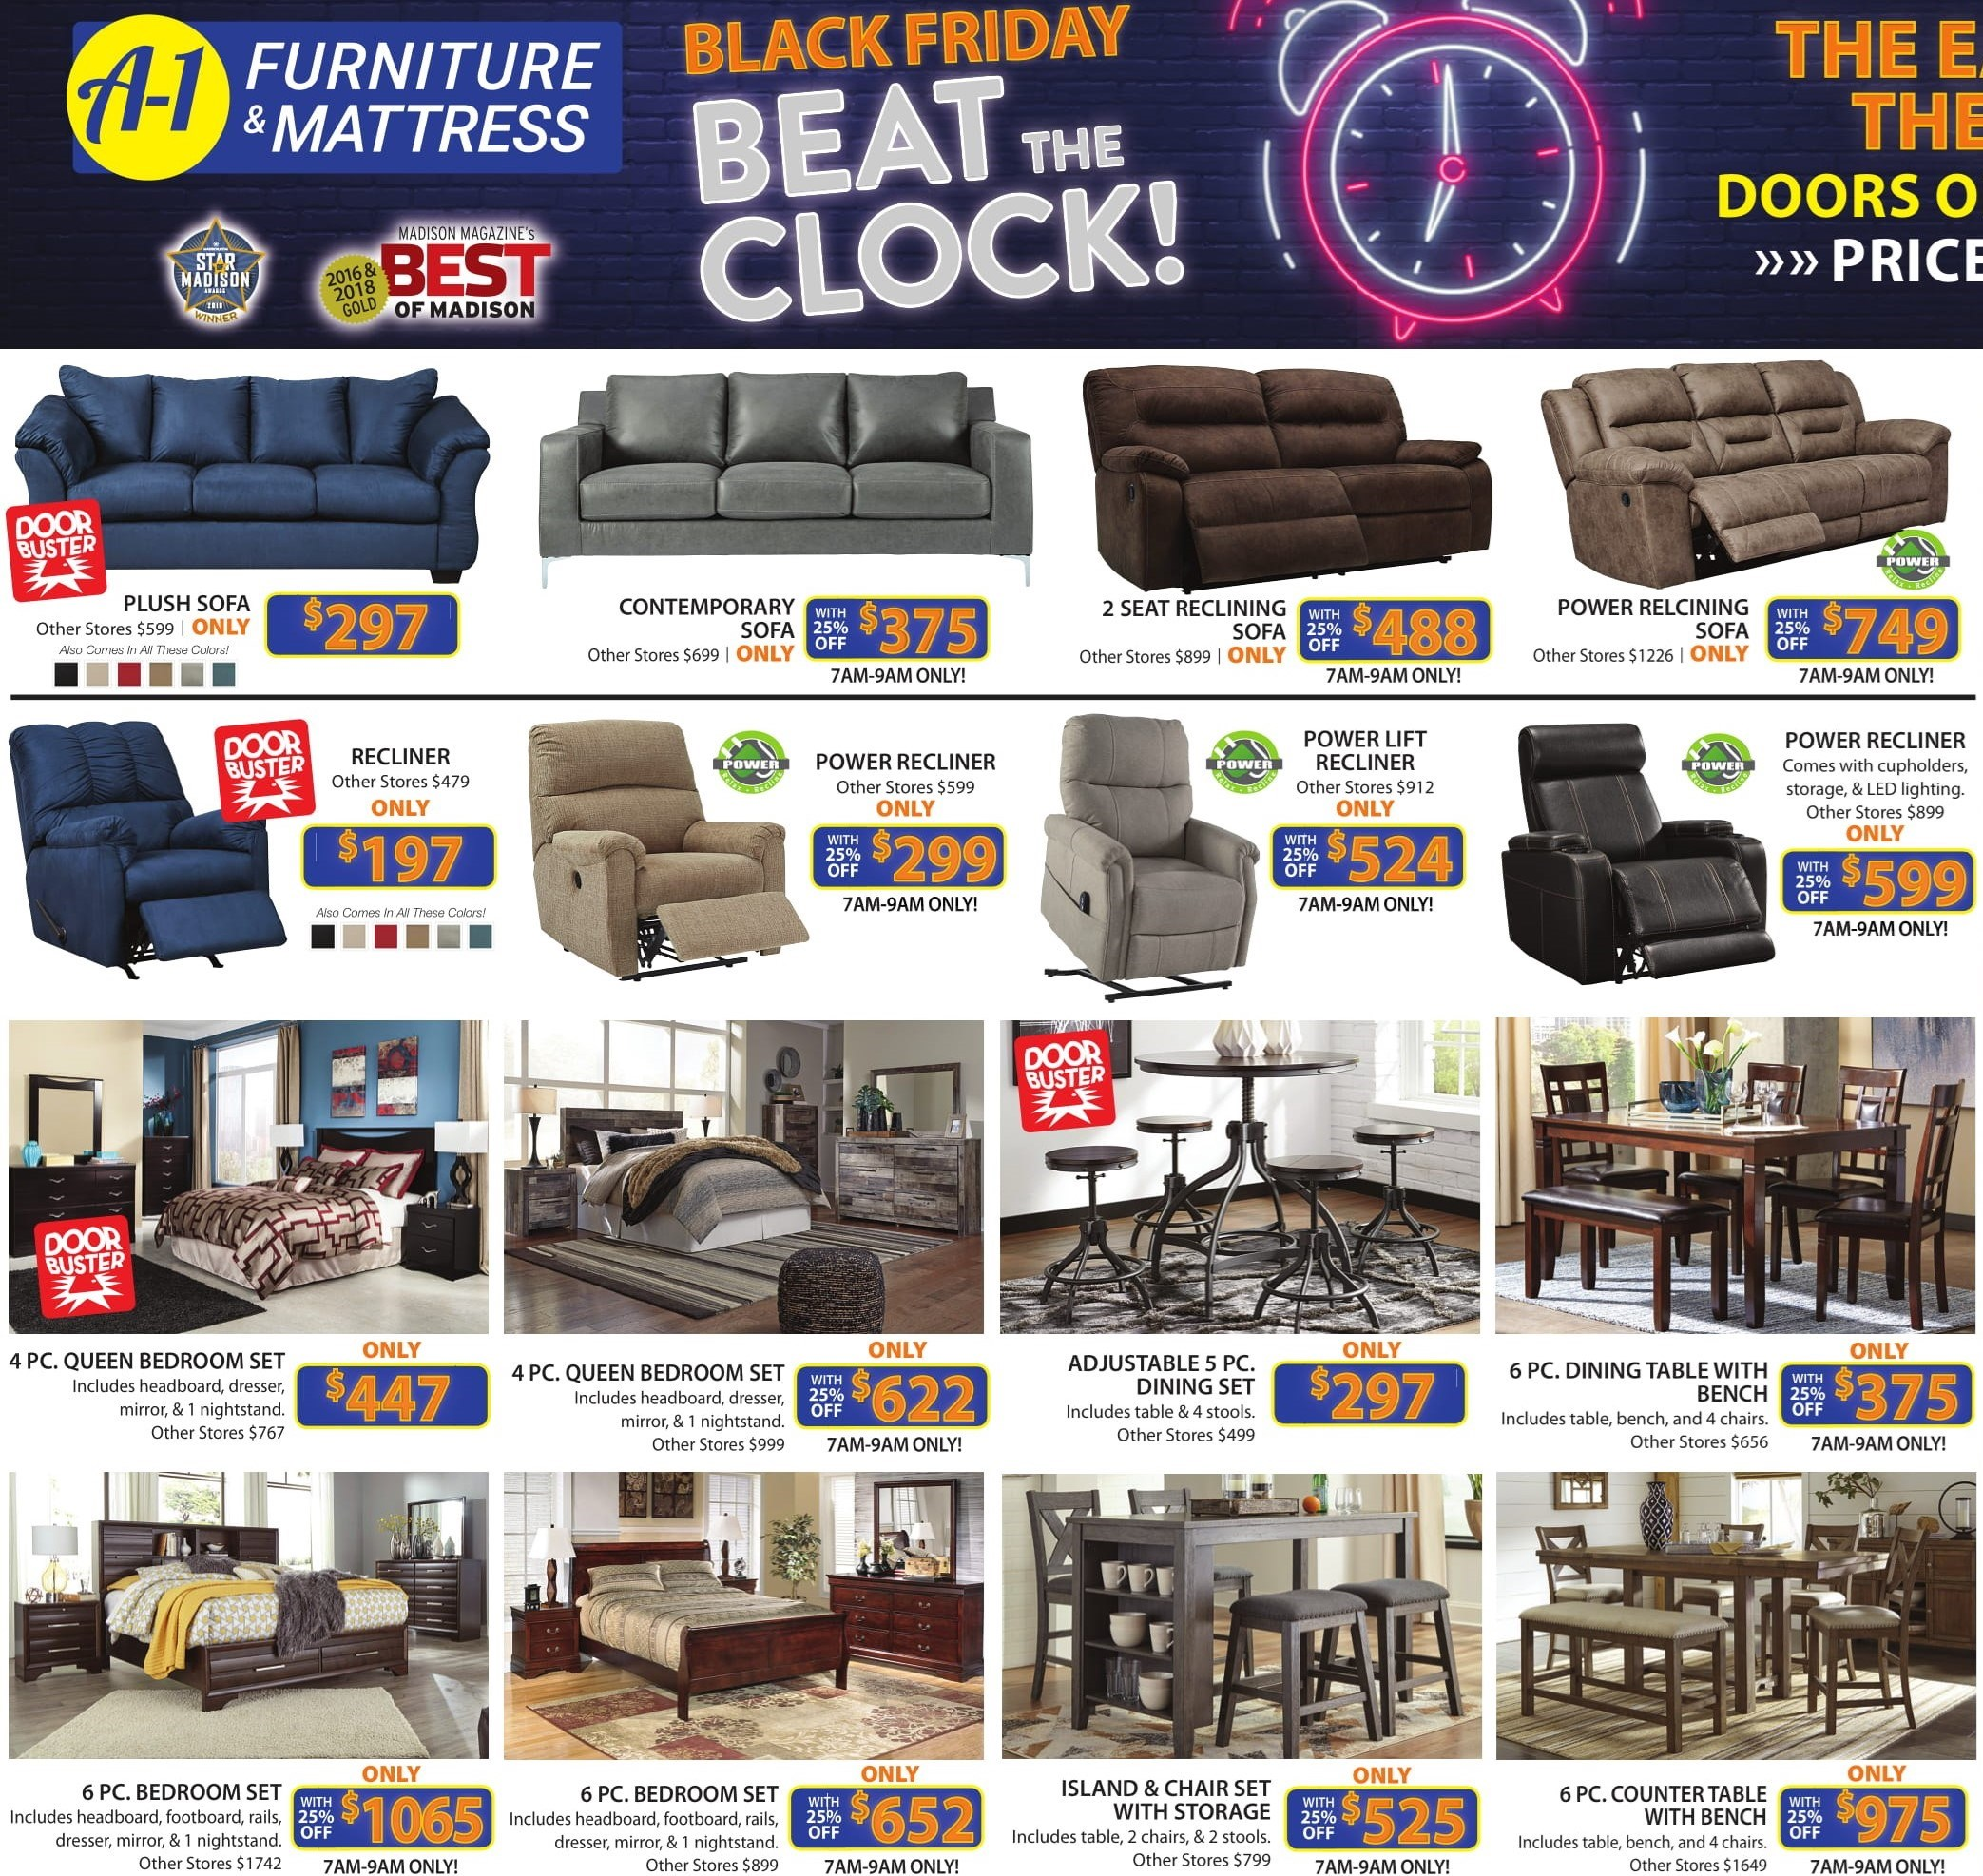 Sensational Early Black Friday Private Sale A1 Furniture Mattress Spiritservingveterans Wood Chair Design Ideas Spiritservingveteransorg